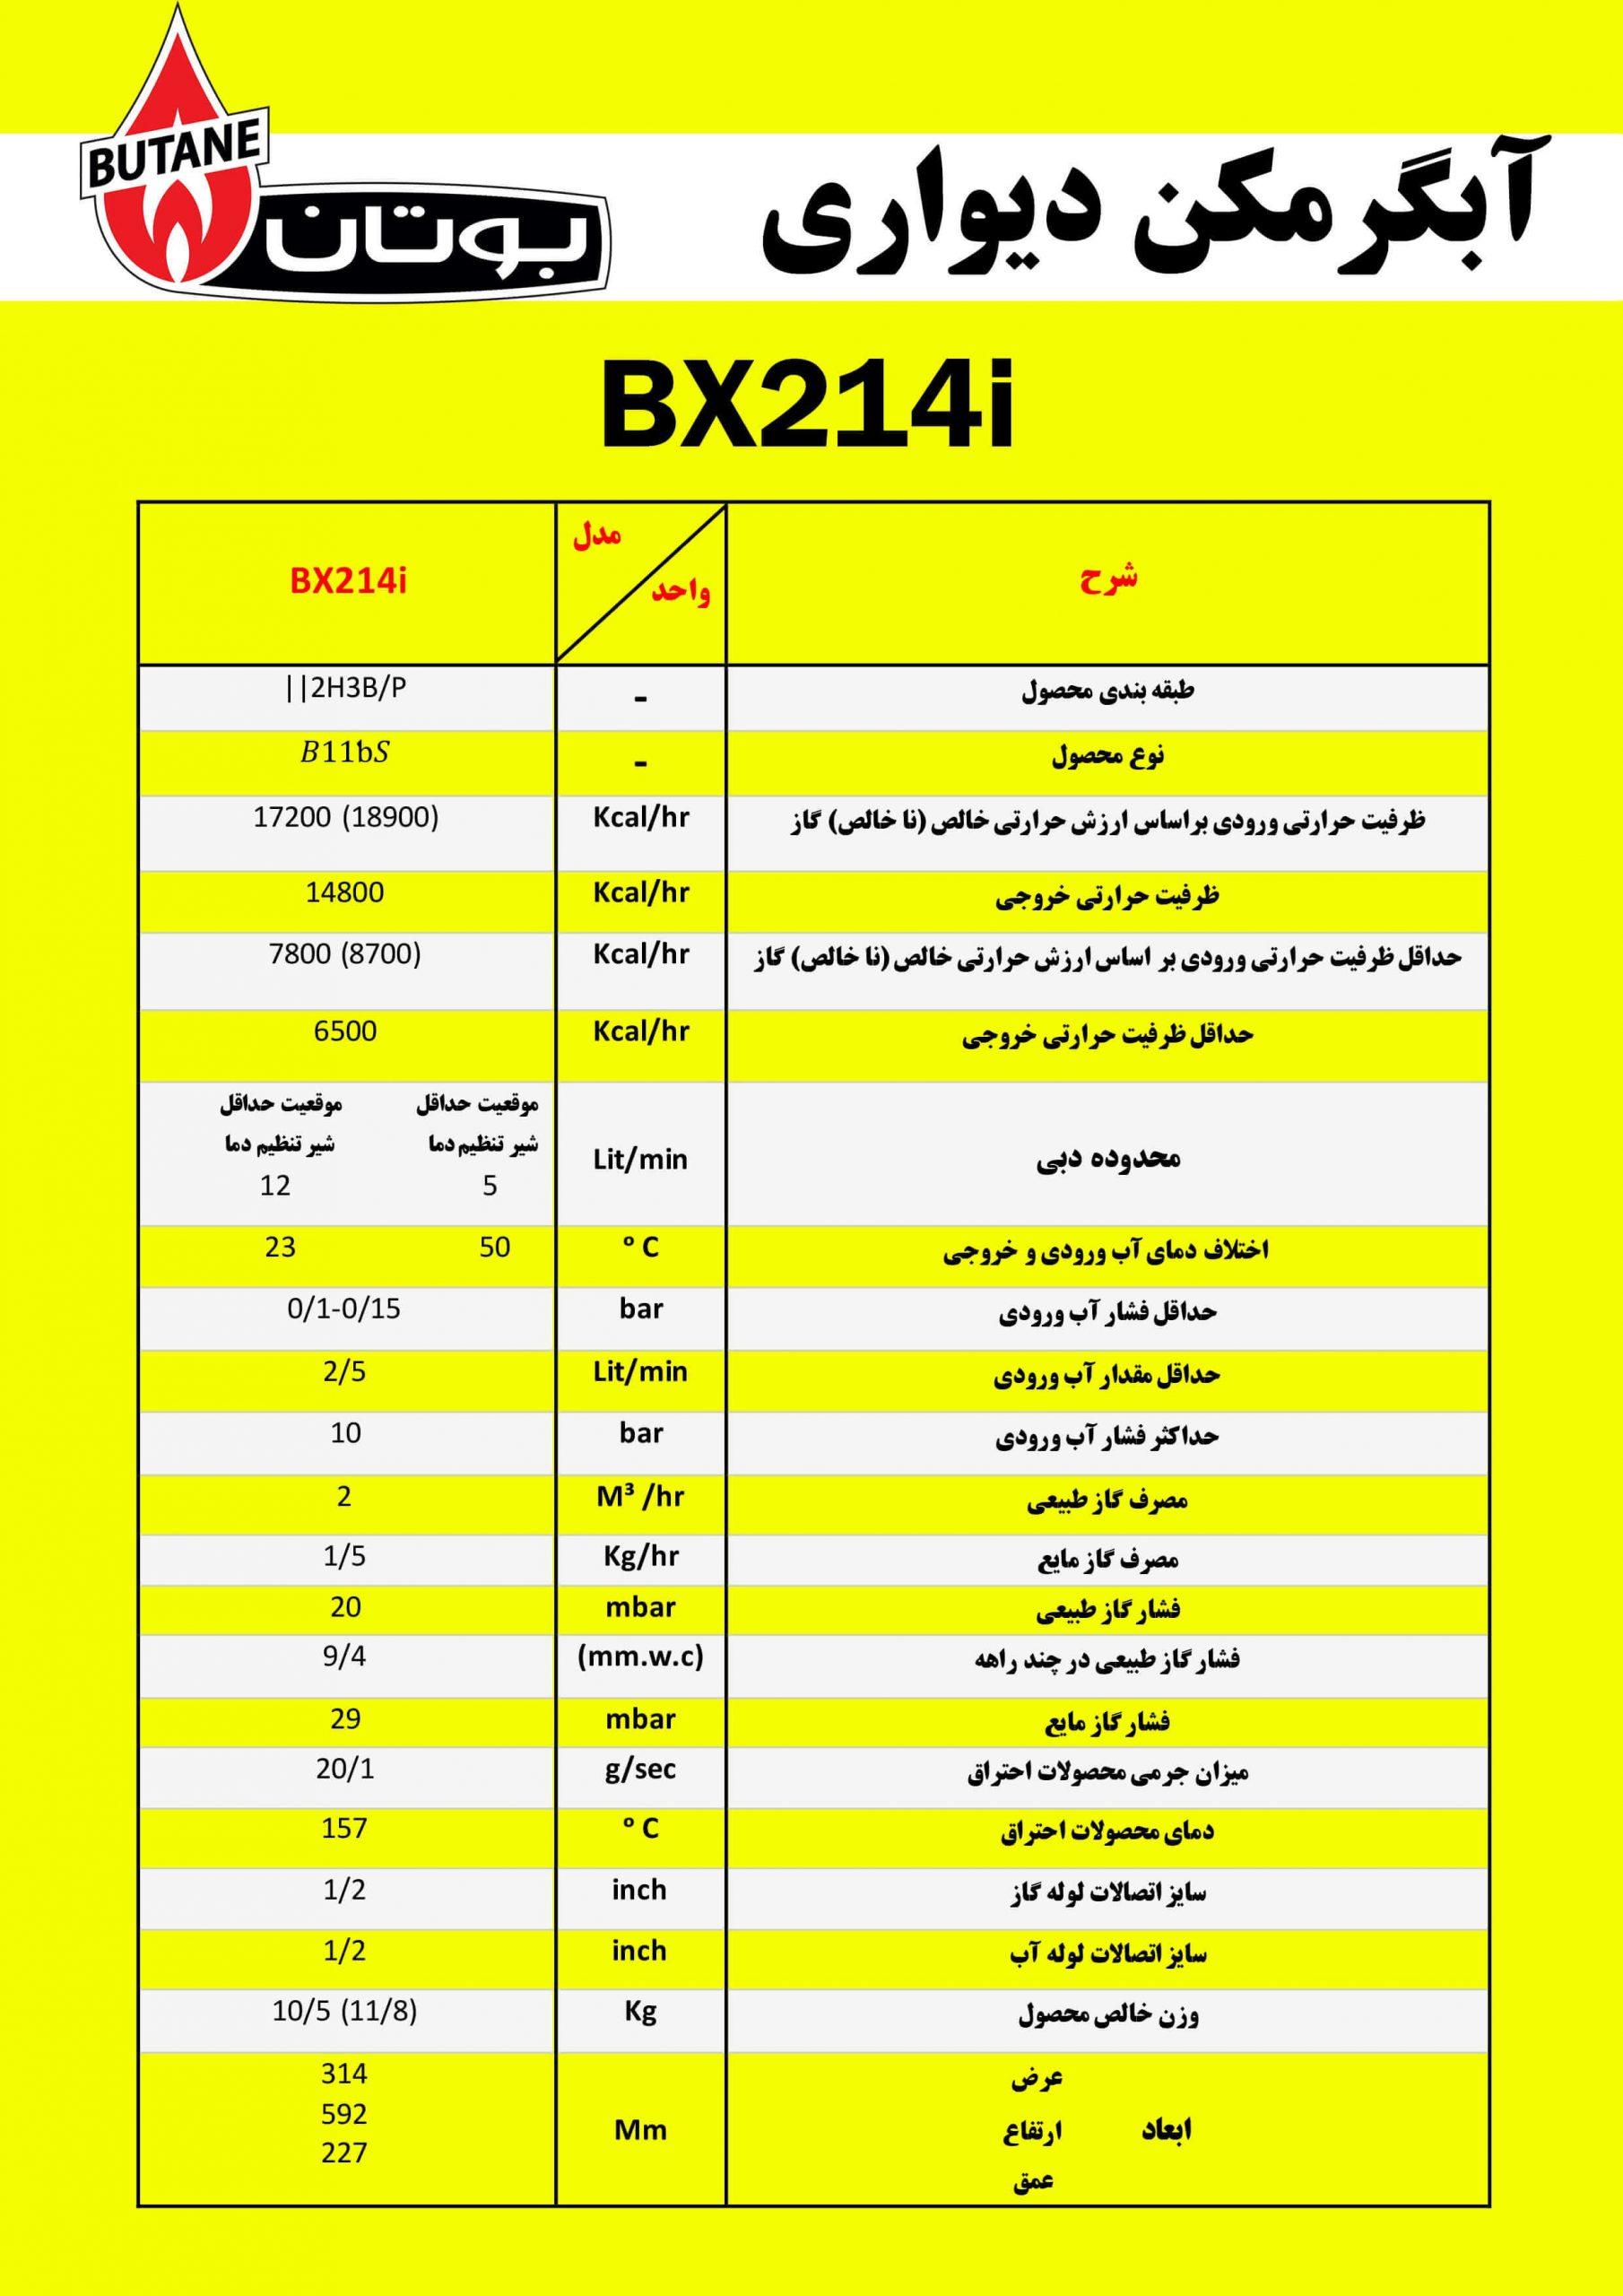 آبگرمکن دیواری بوتان مدل BX214